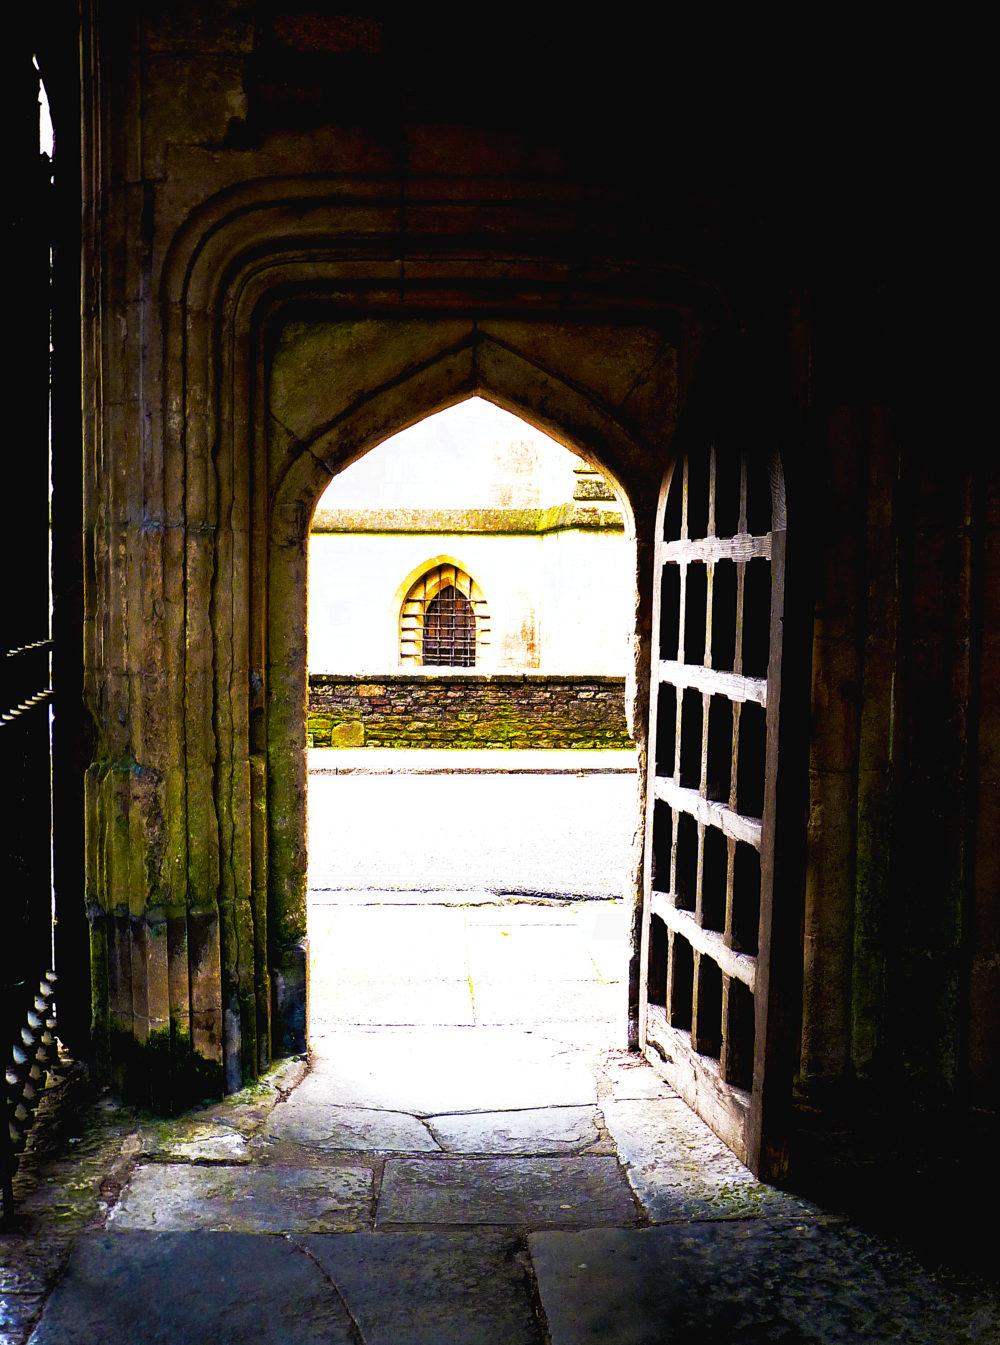 """Wells - doorway vicar's row"" by Sarah is licensed under CC BY 2.0"